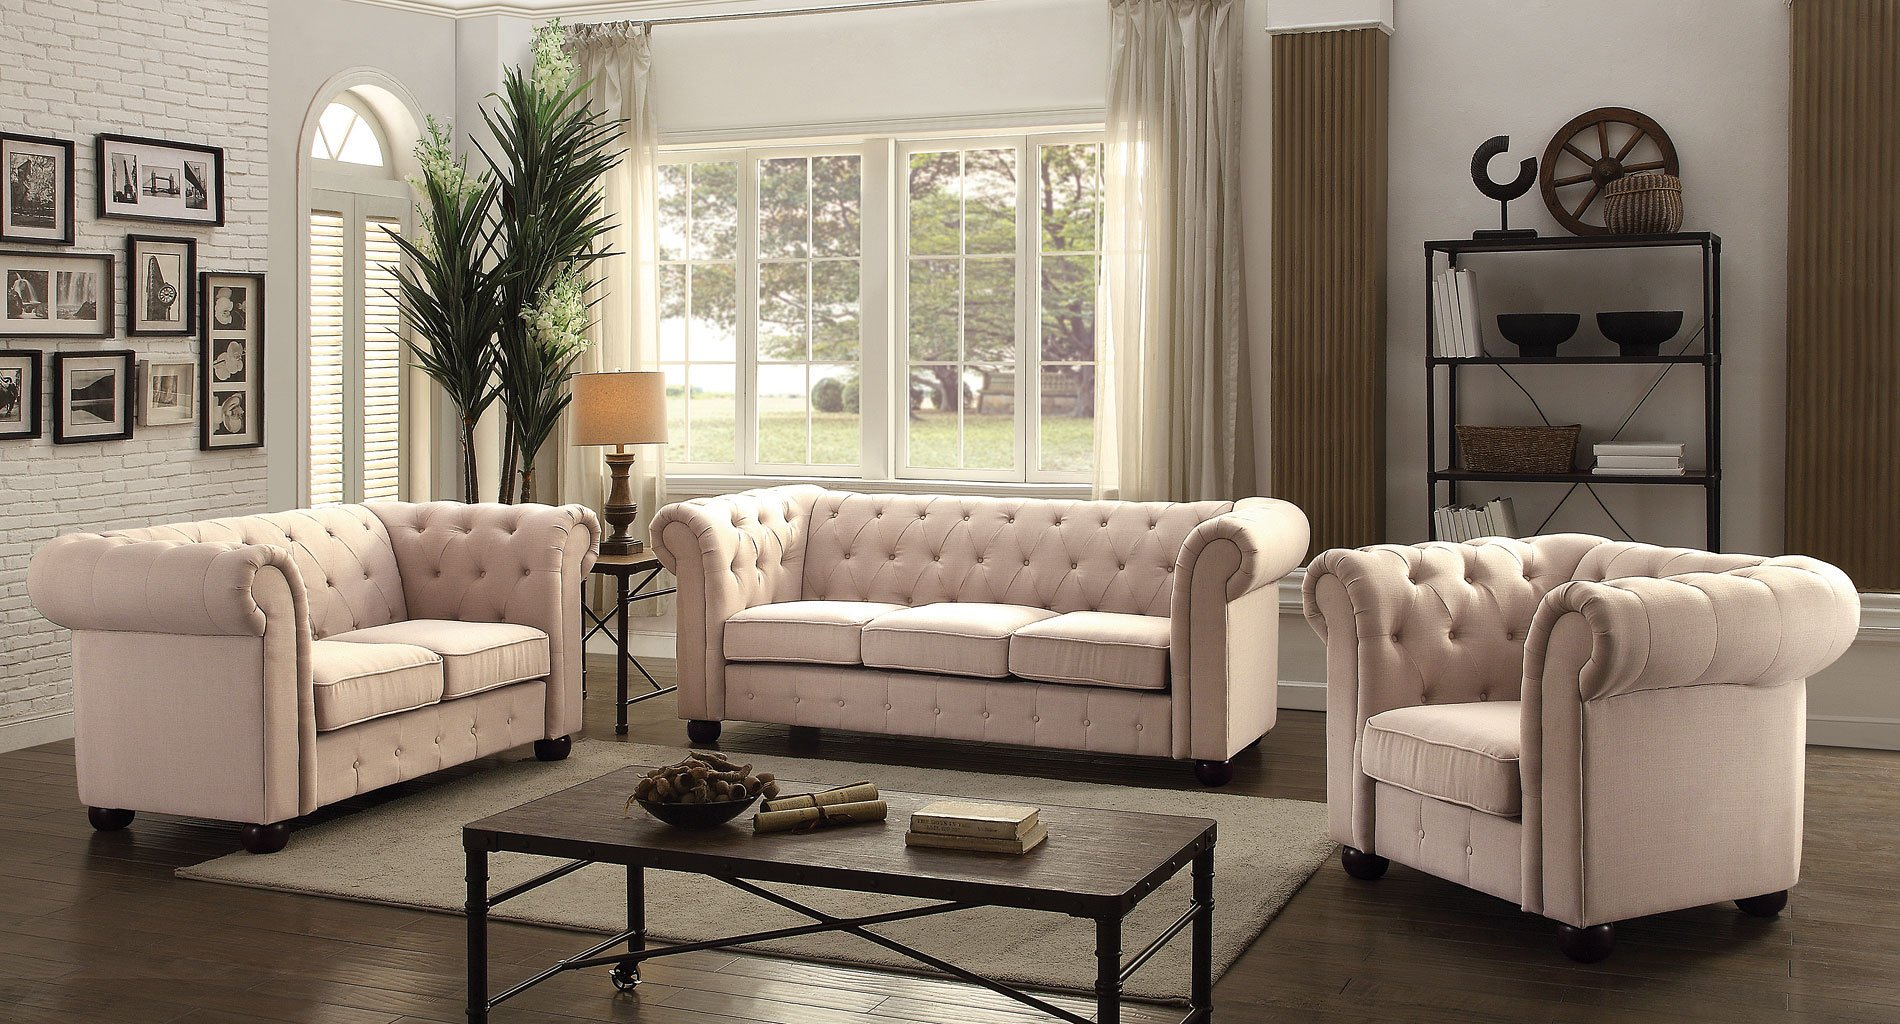 G578 tufted living room set tan